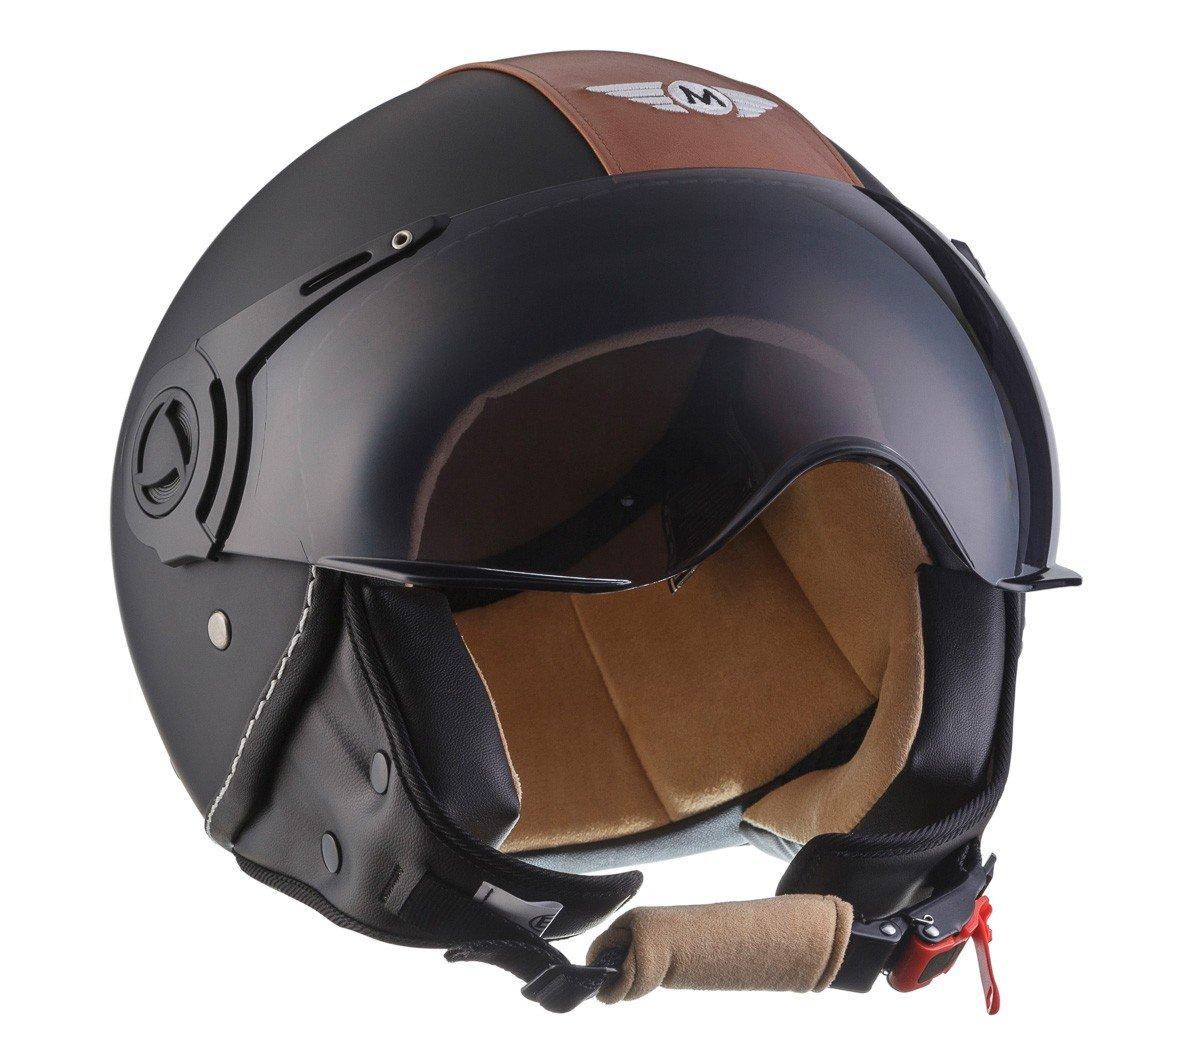 Amazon.es: Moto Helmets H44 - Helmet Casco de Moto, Negro/Marrón, M (57-58cm)